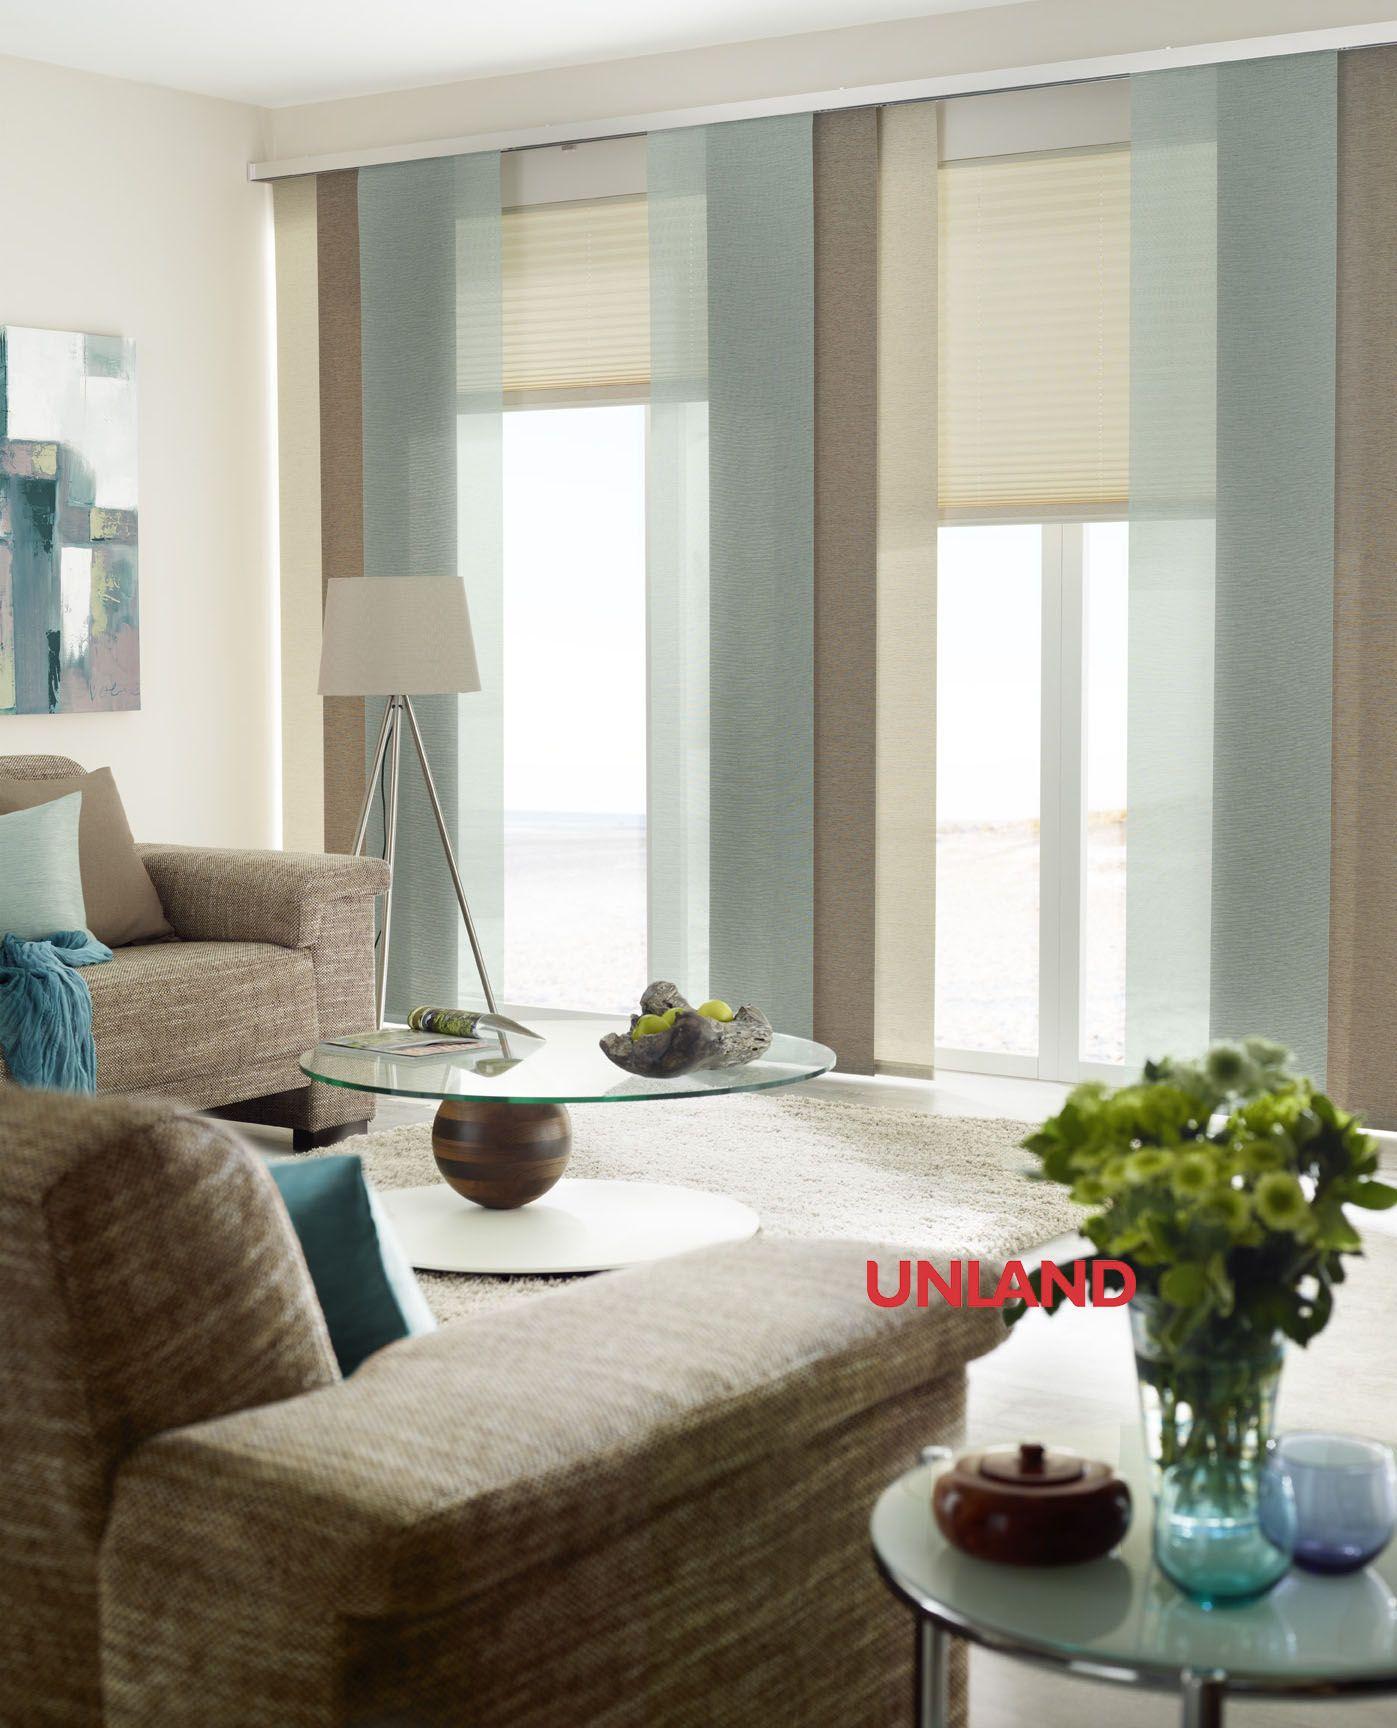 Unland Urbansteel Tecno, Vorhang, Fensterideen, Gardinen und